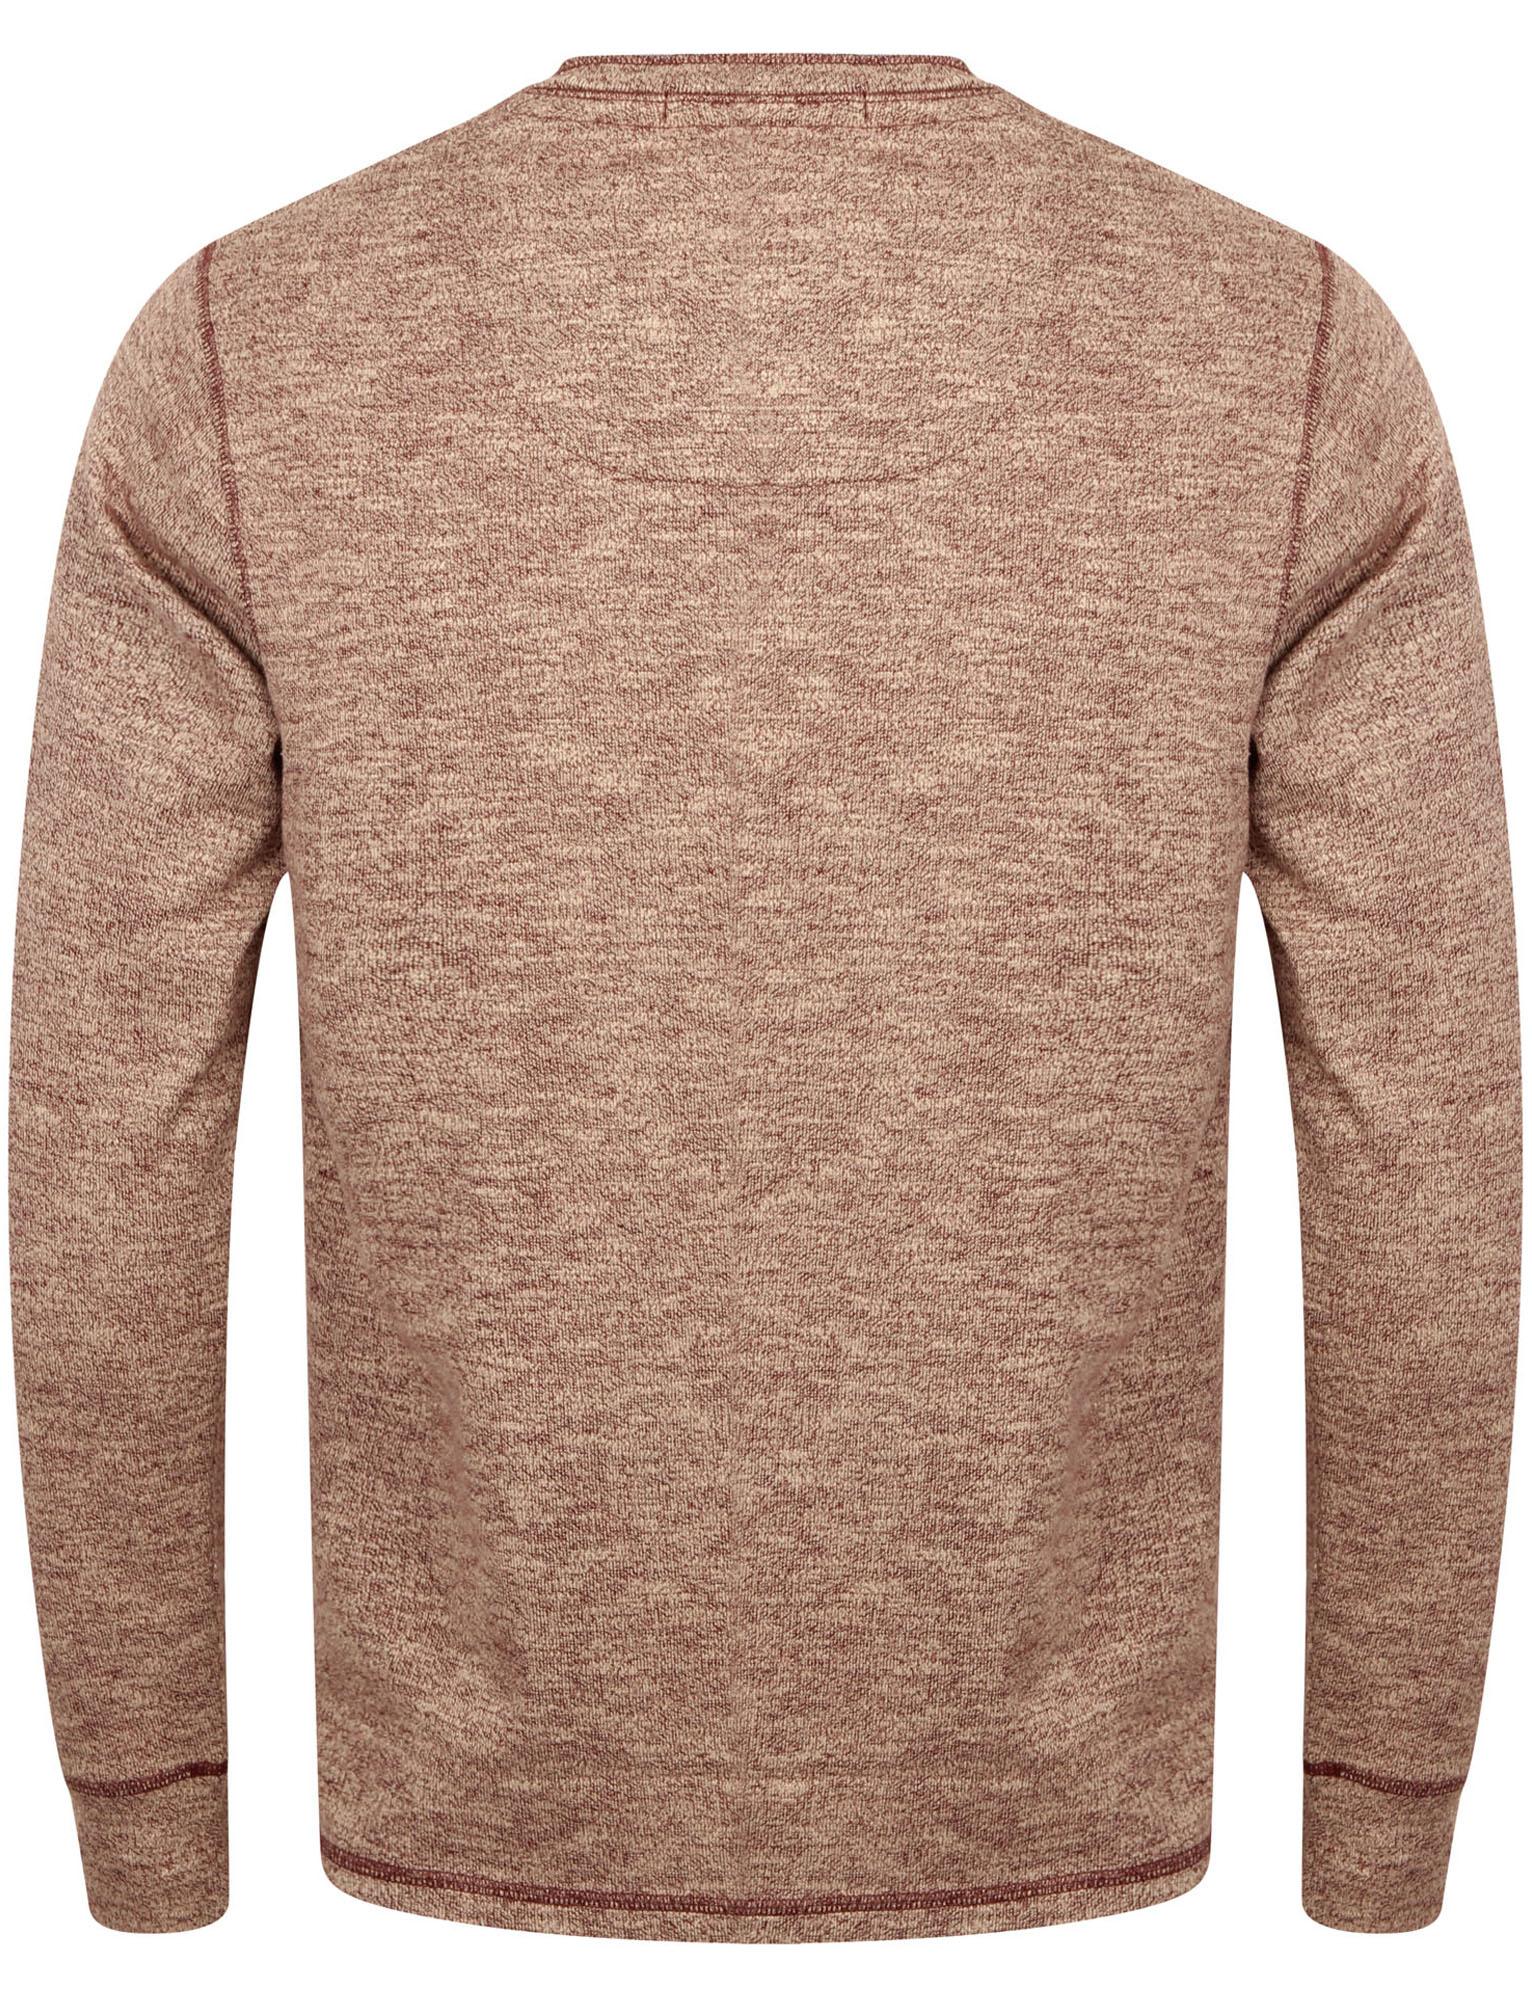 NUOVI-Pantaloncini-Uomo-Tokyo-Laundry-ROOSEVELT-T-shirt-A-Maniche-Lunghe-Henley-Taglia-S-XL